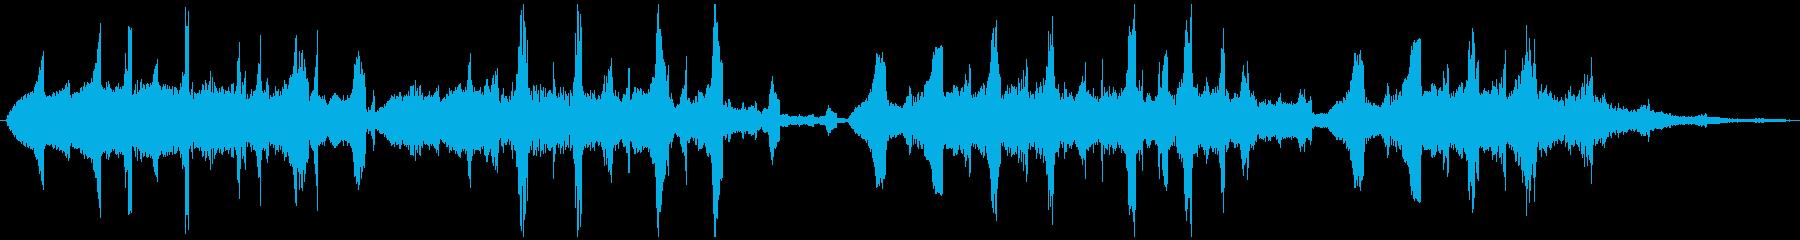 PADS グリッチートランス02の再生済みの波形